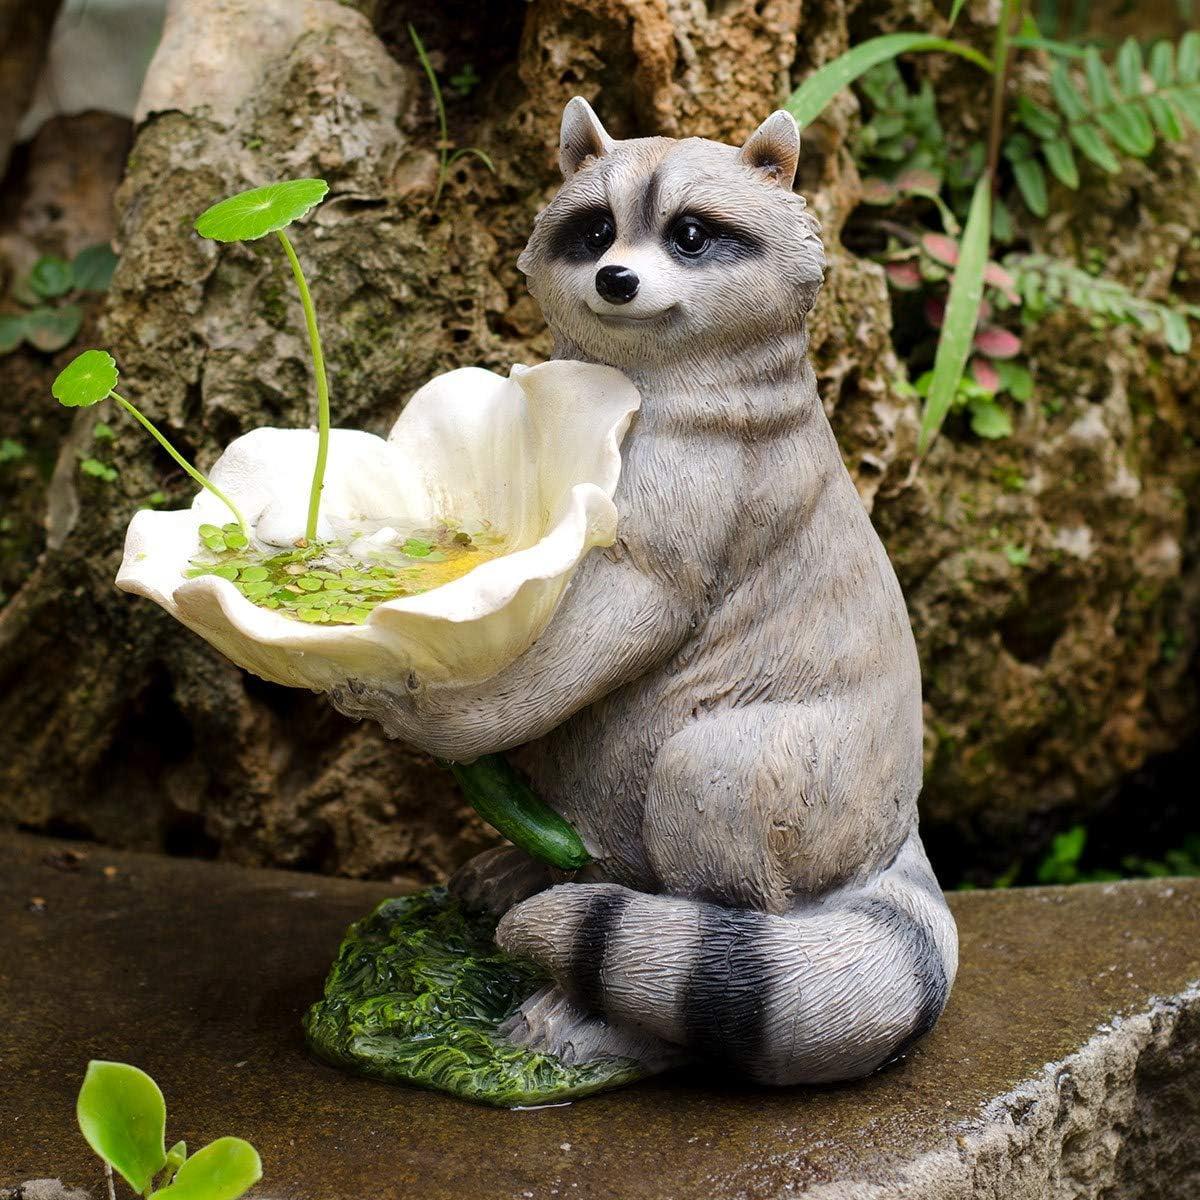 NBHUZEHUA Resin Raccoon Statue Wild Finch Bird Feeders for Gardern Lawn Outside Figurines Decor